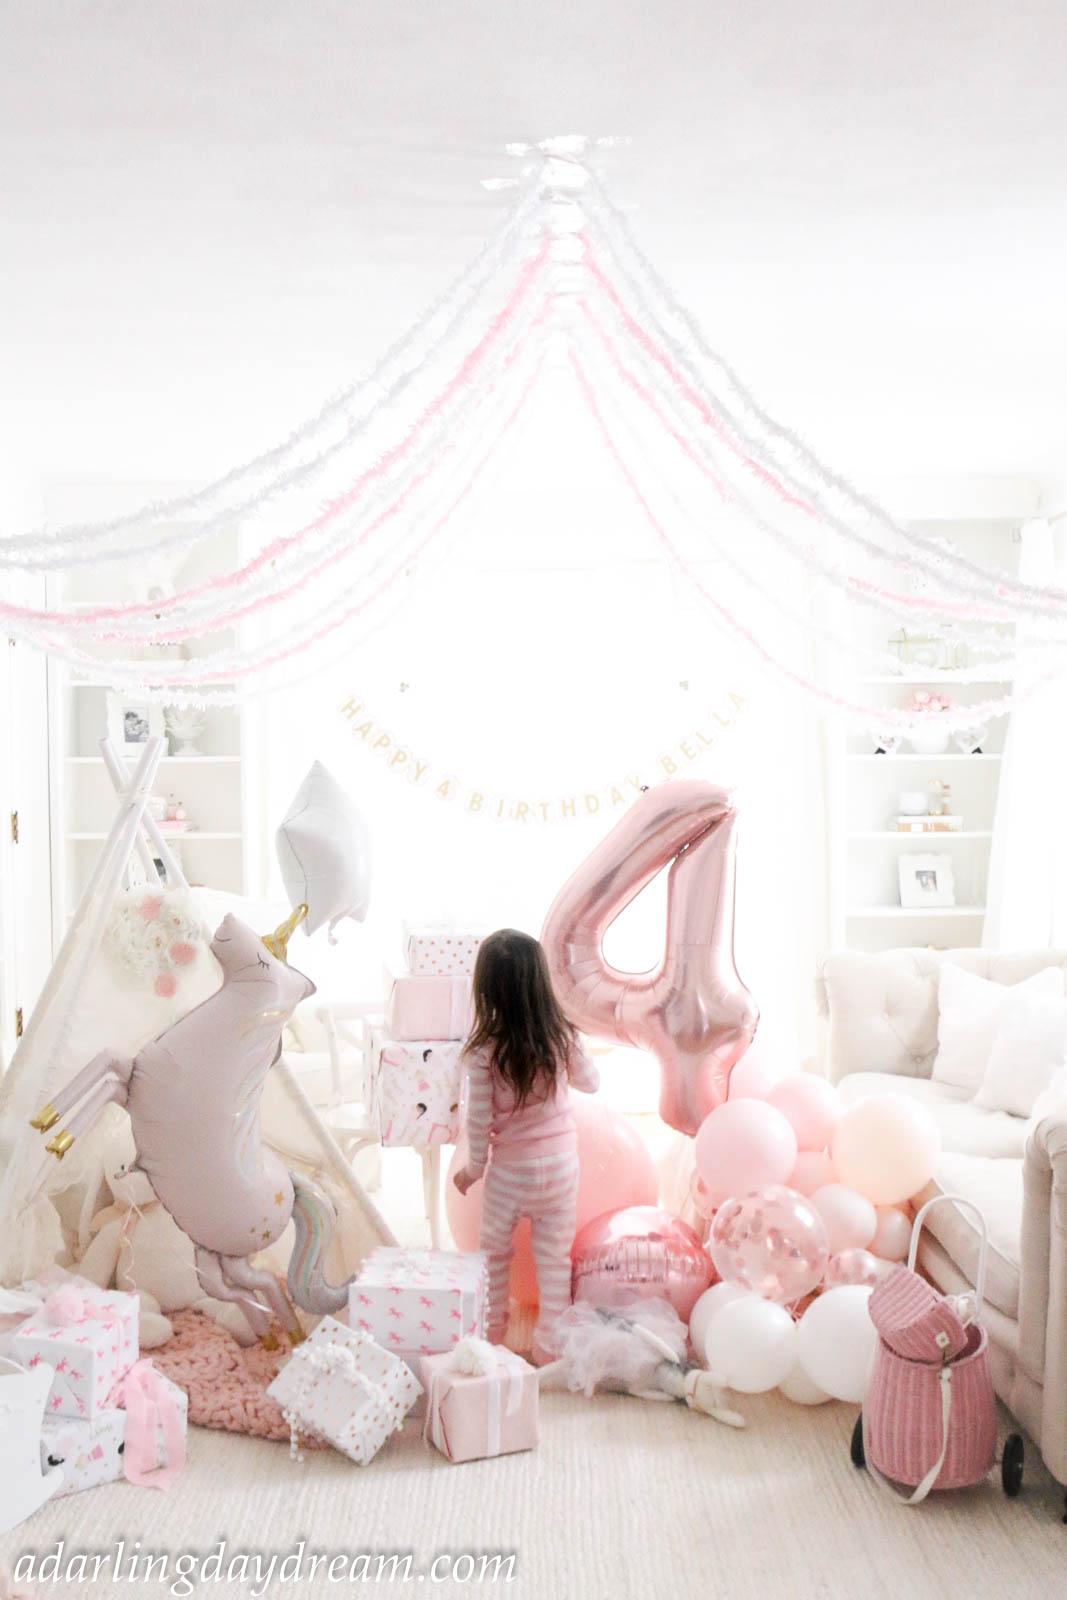 Bella-s-4th-Birthday-morning-surprise-18